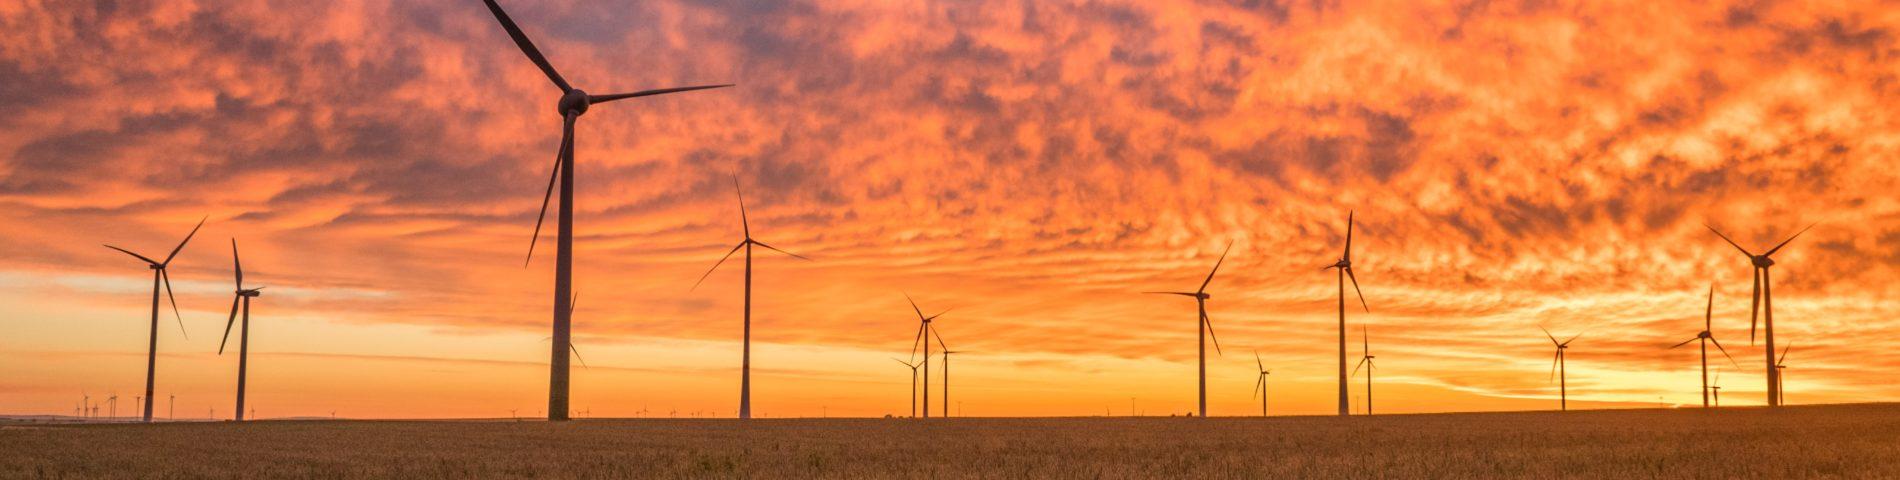 Windräder in Feldern im Sonnenuntergang